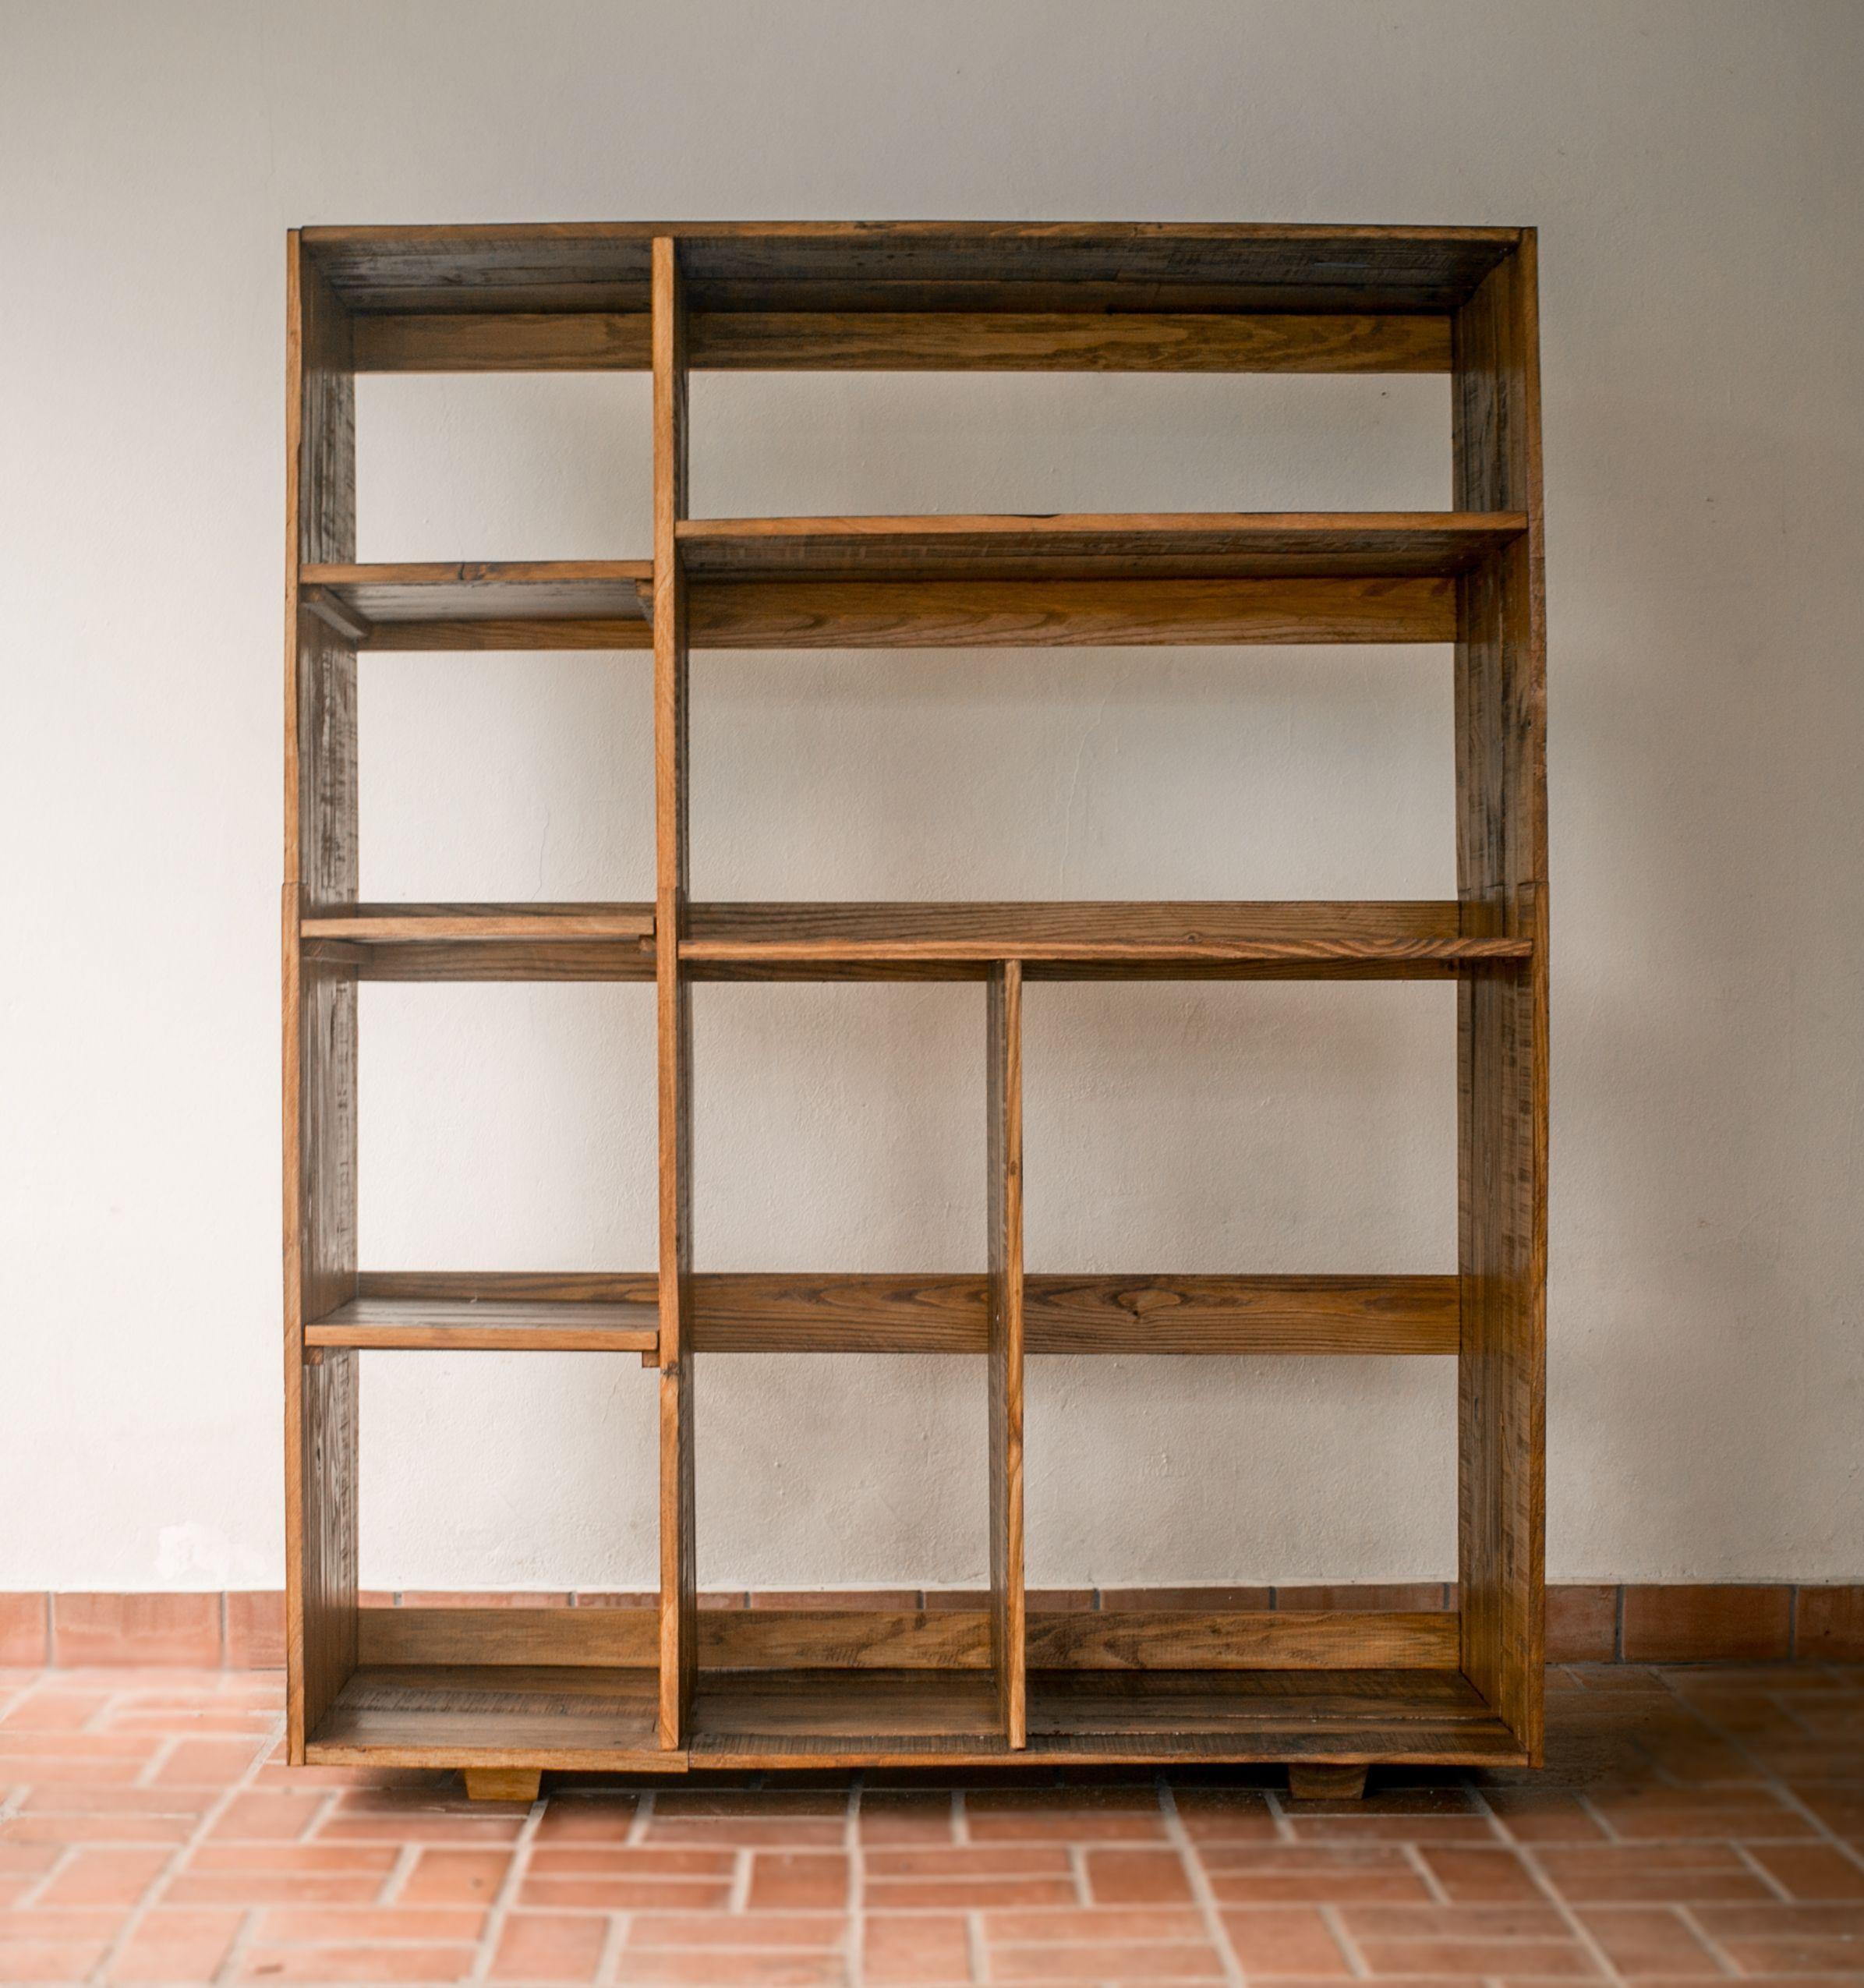 Pallet Furniture For Storage Mueble De Pallets Organizador By  # Muebles Novedosos